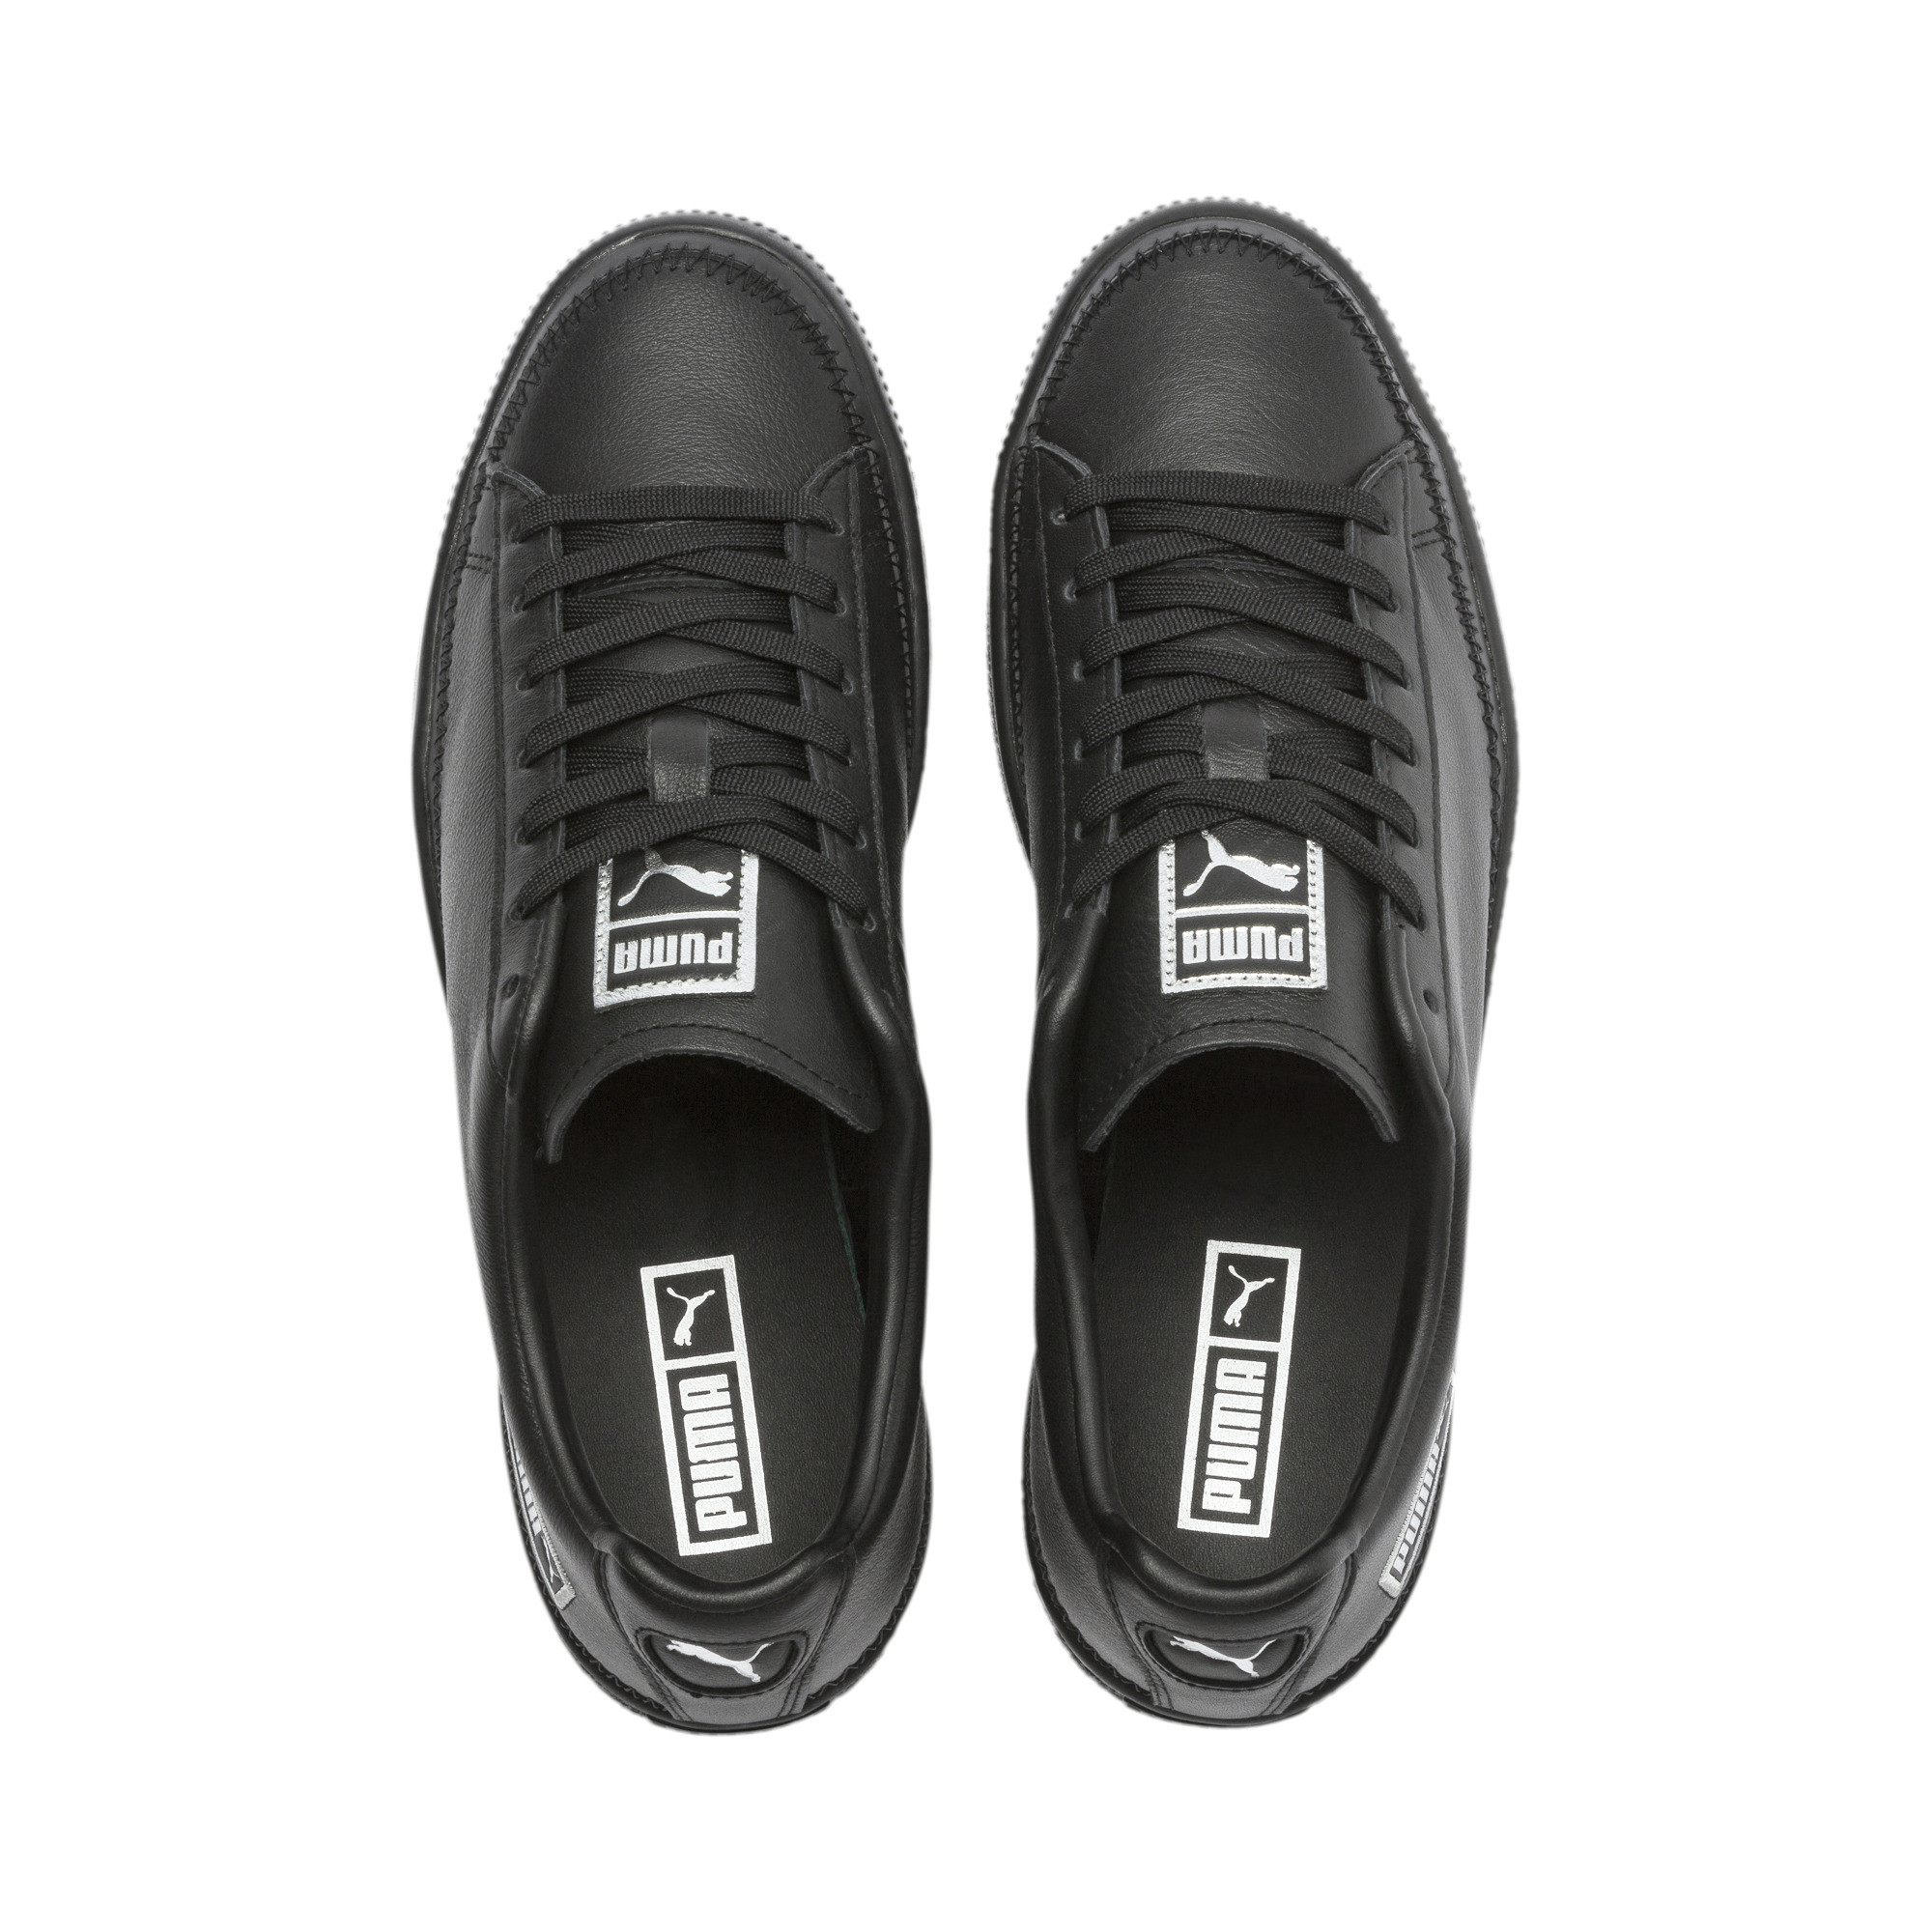 PUMA-Basket-Stitch-Sneaker-Unisex-Schuhe-Neu Indexbild 13